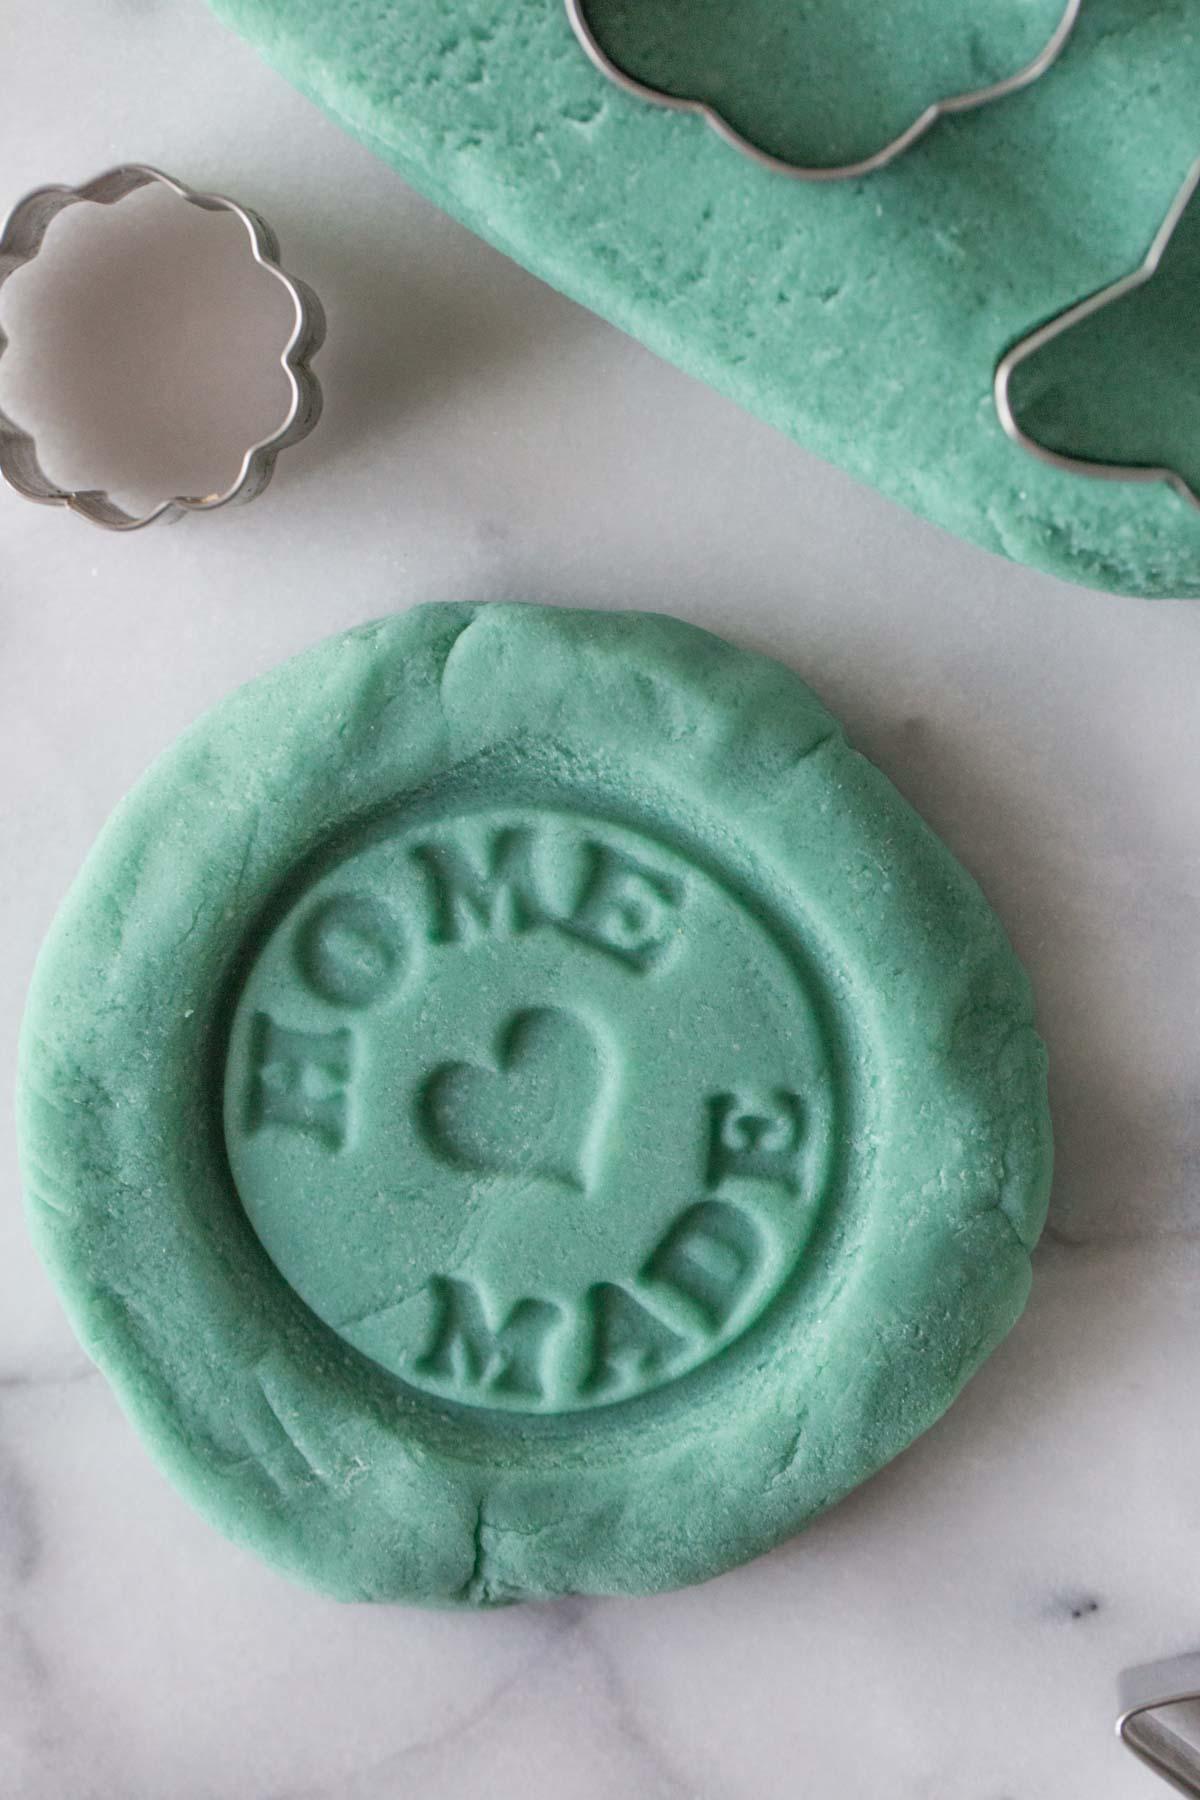 A close-up view of blue playdough with a homemade stamp pressed into the dough.